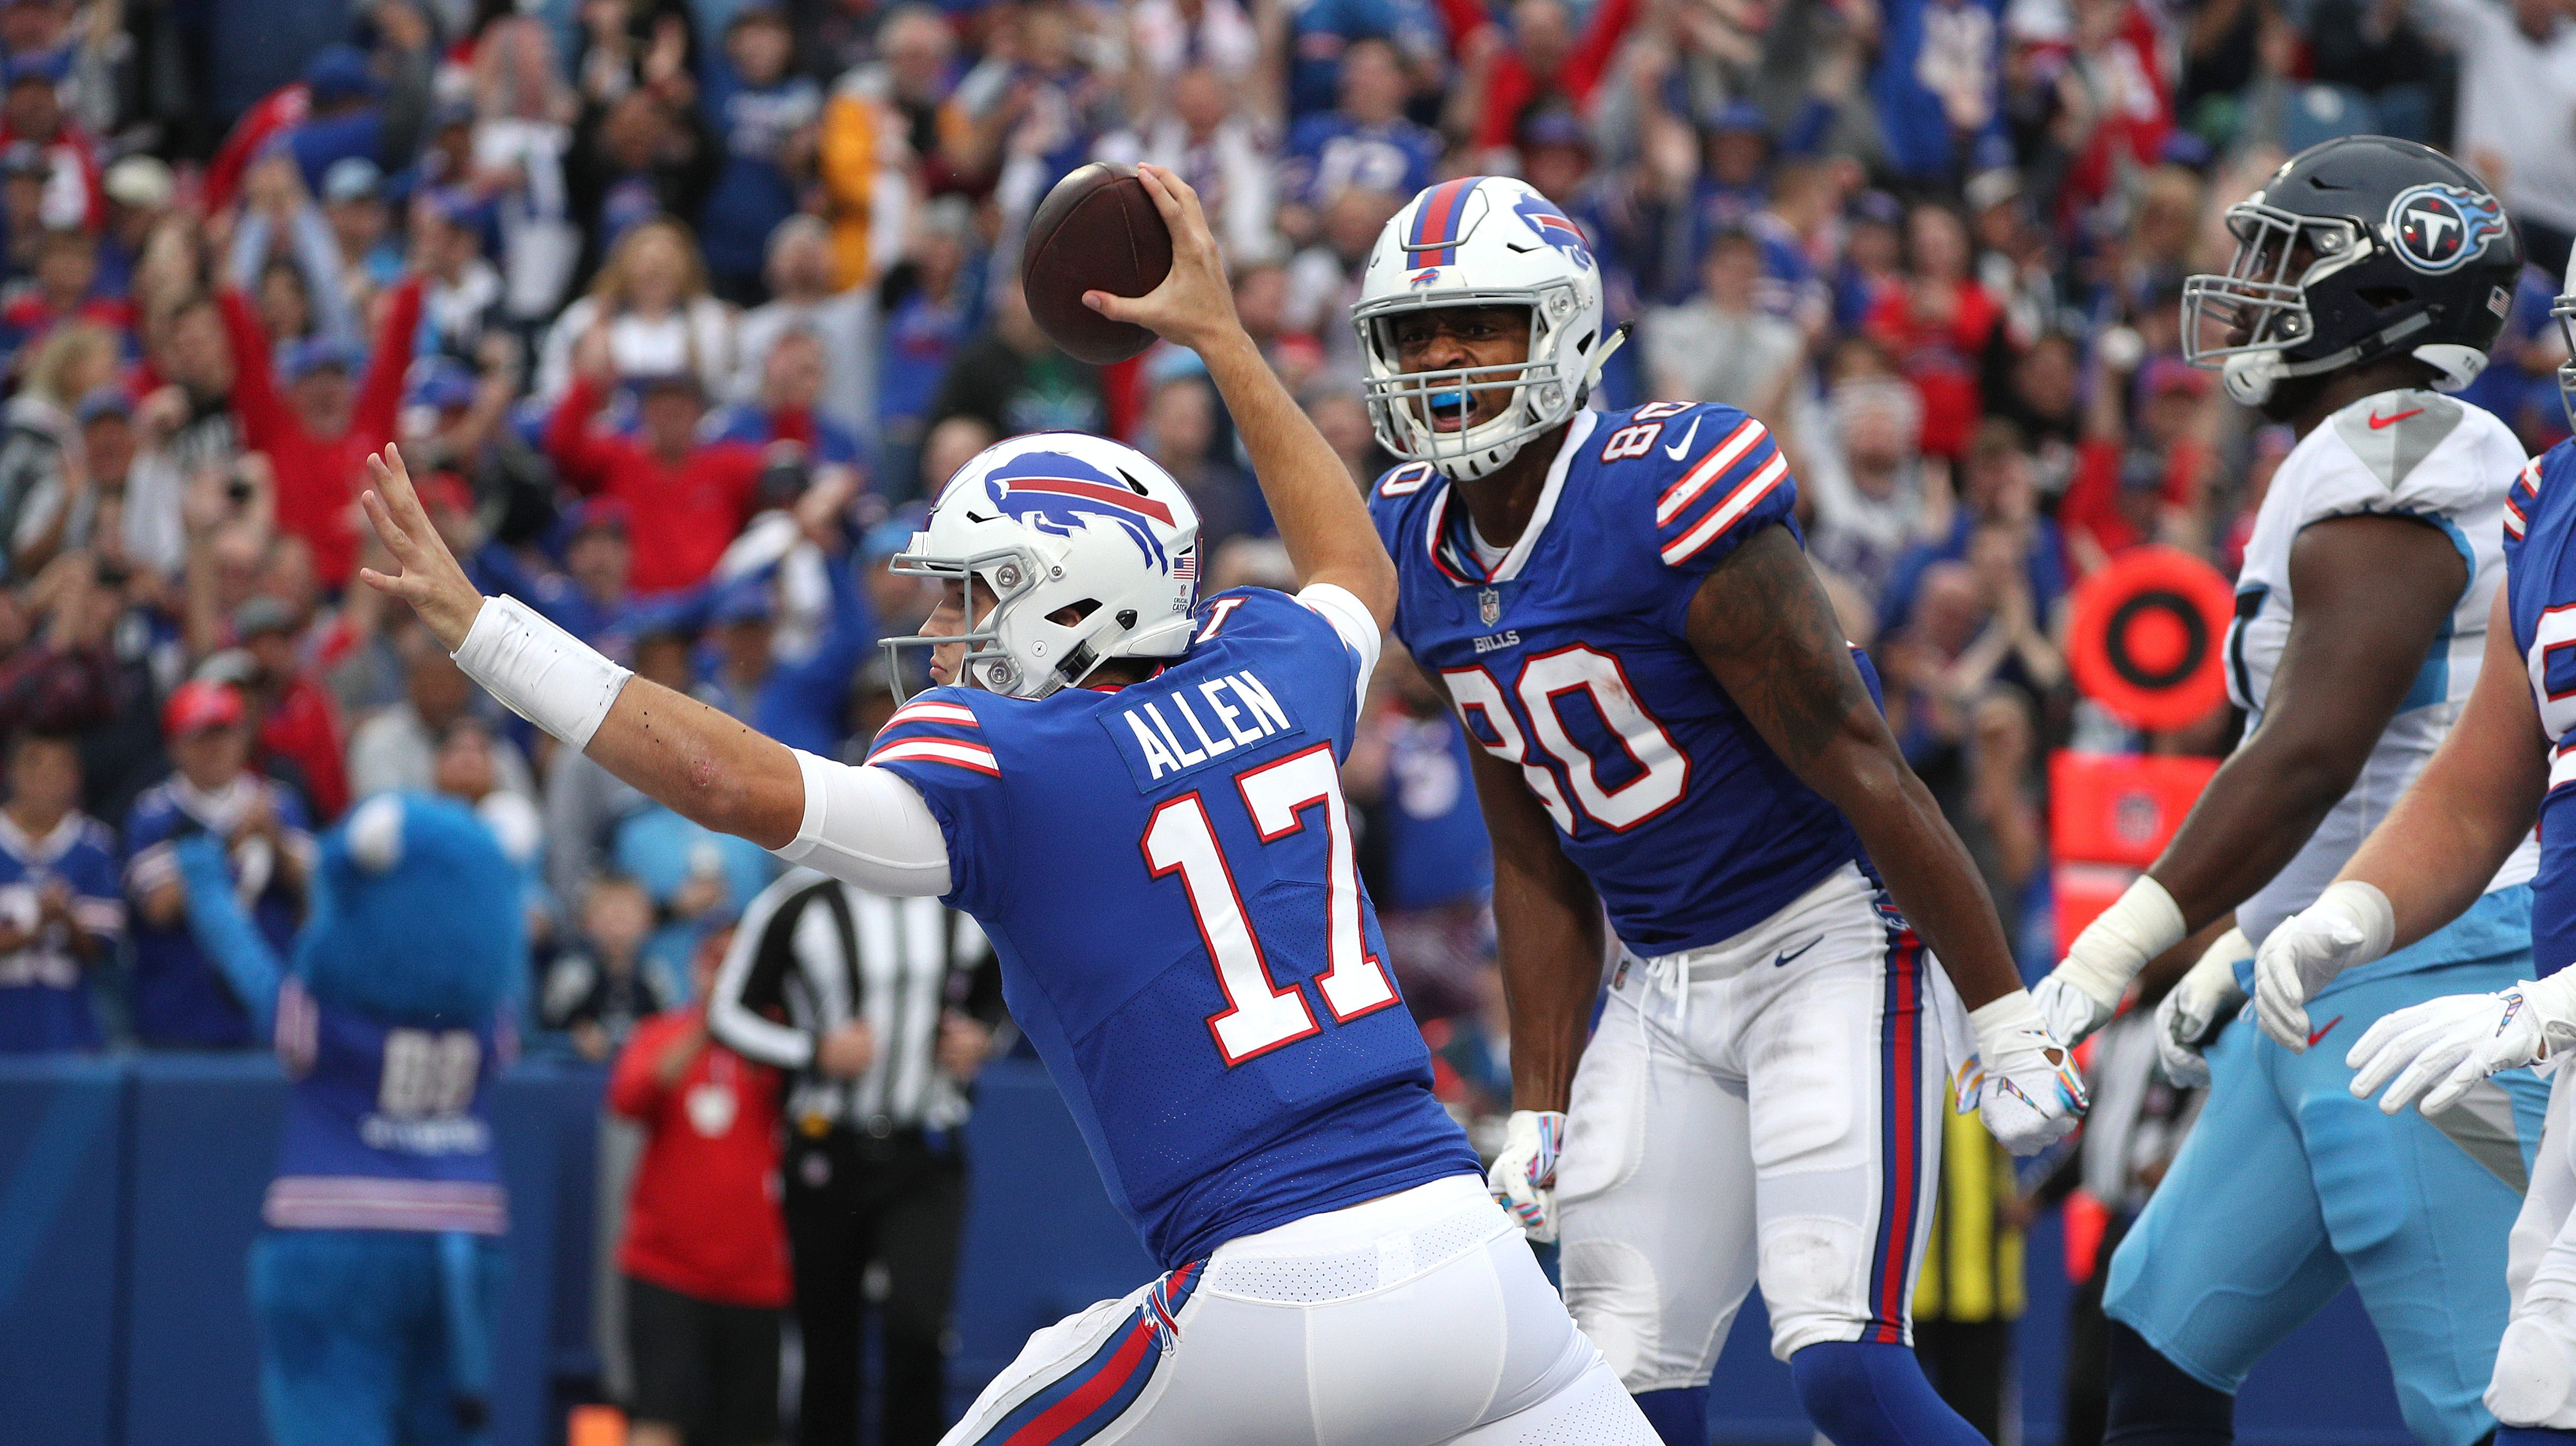 Bills quarterback Josh Allen's stats were ugly but he doesn't care one bit